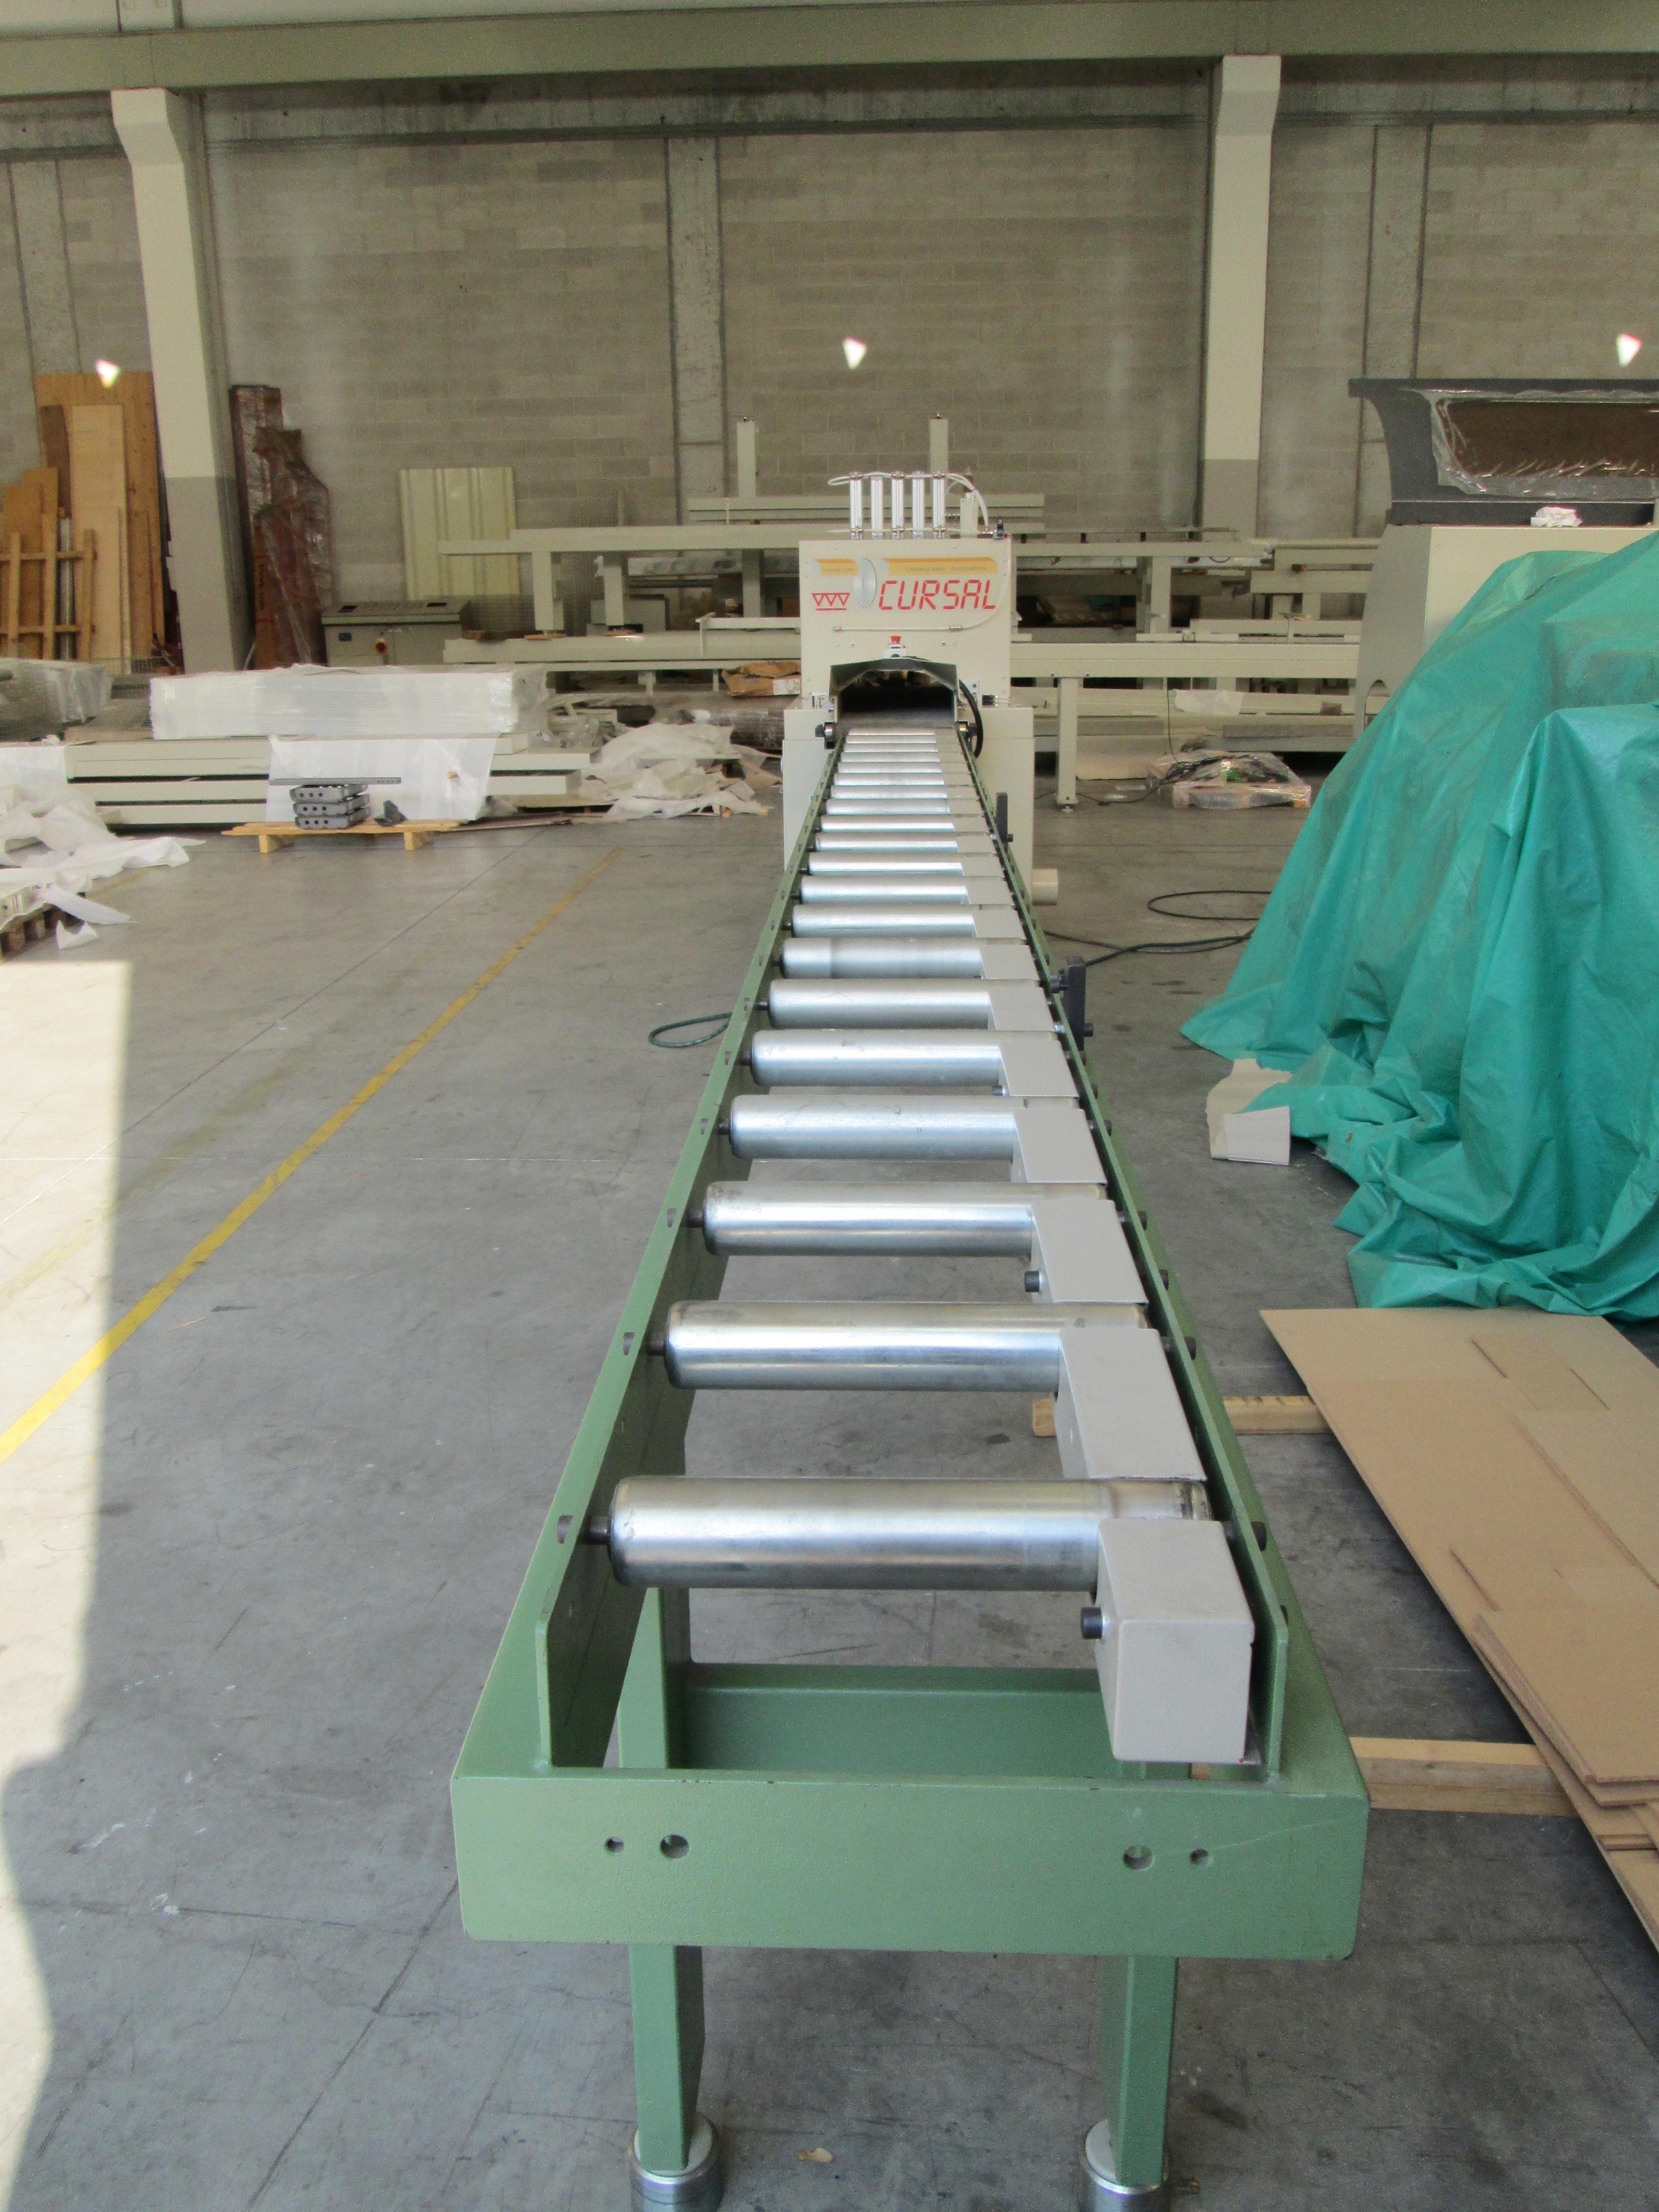 cursal-florian legno-trv 1200L 550 (2)